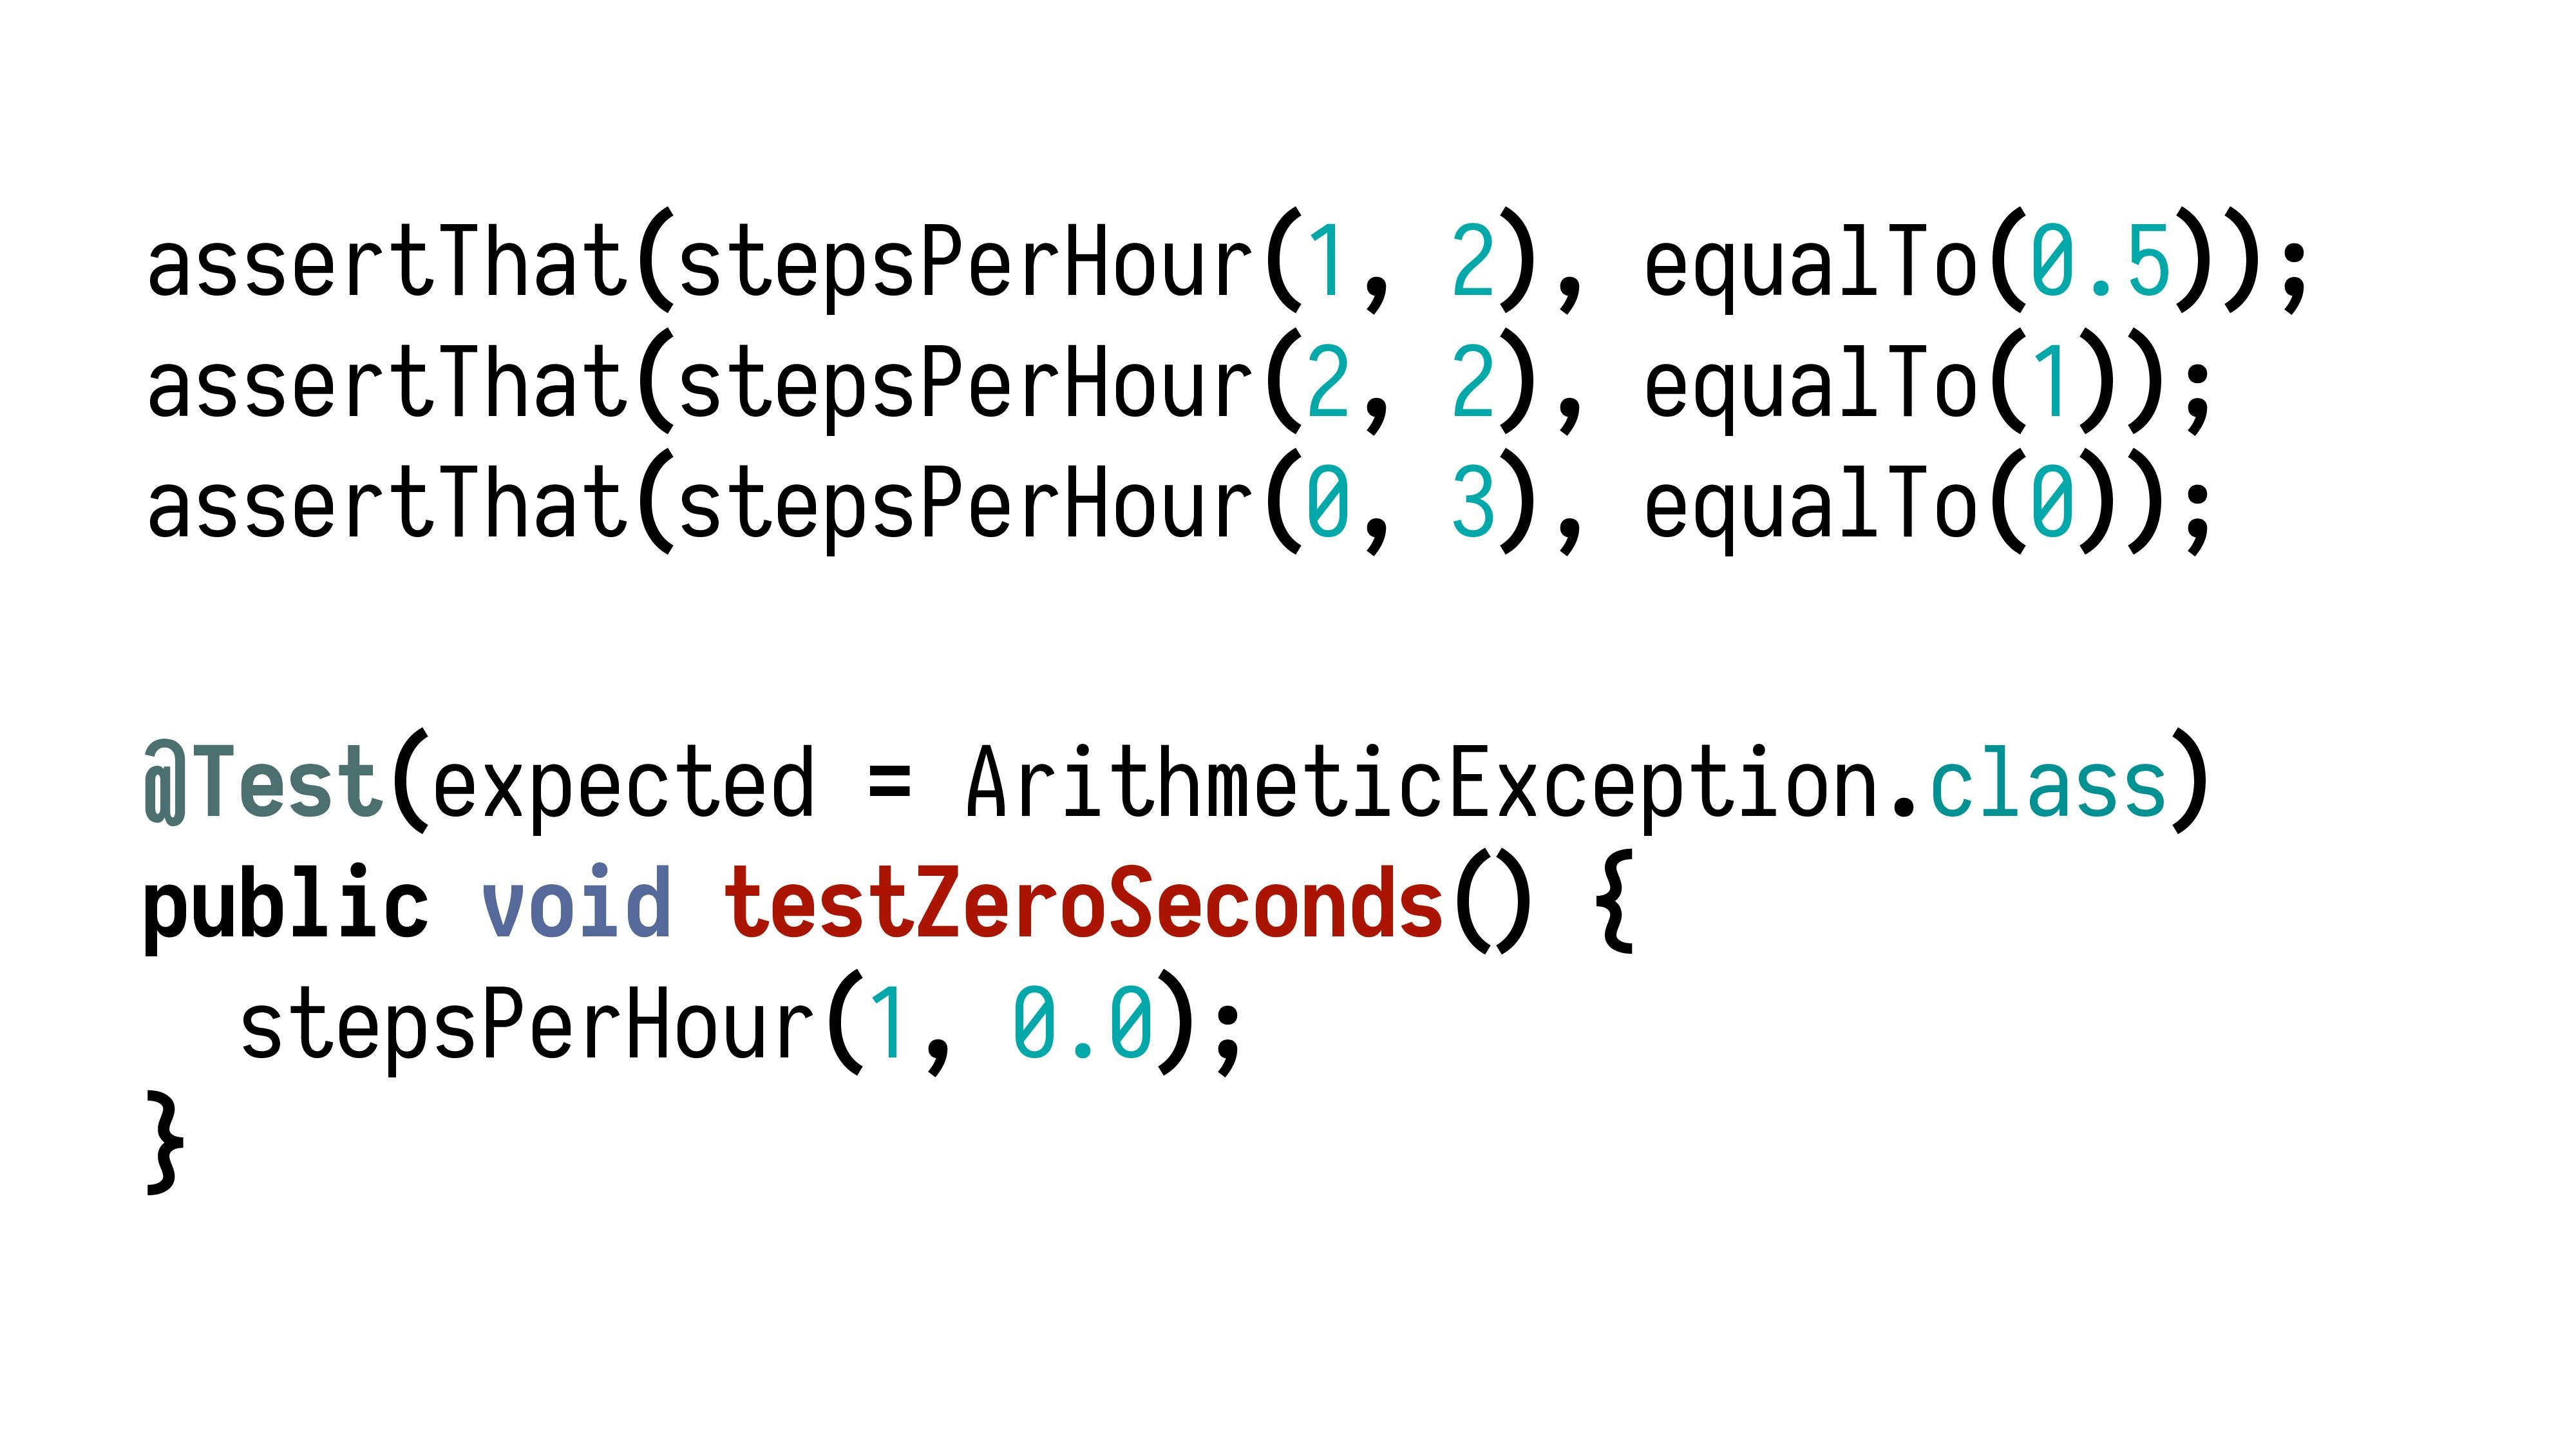 assertThat(stepsPerHour(1, 2), equalTo(0.5)); a...